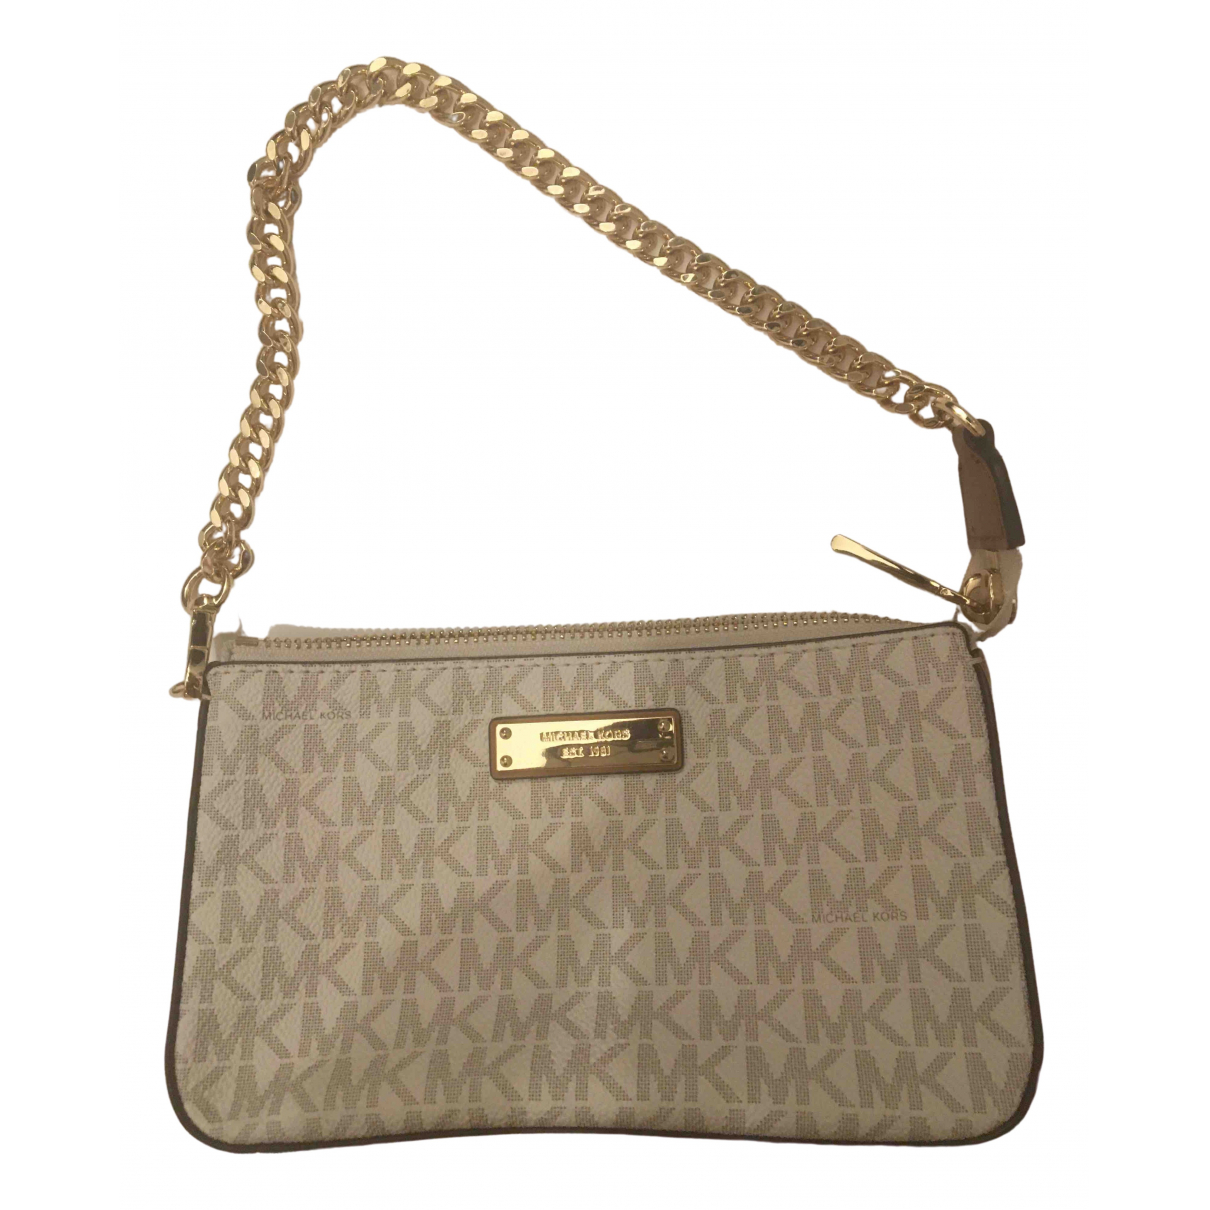 Michael Kors \N Beige Cloth handbag for Women \N